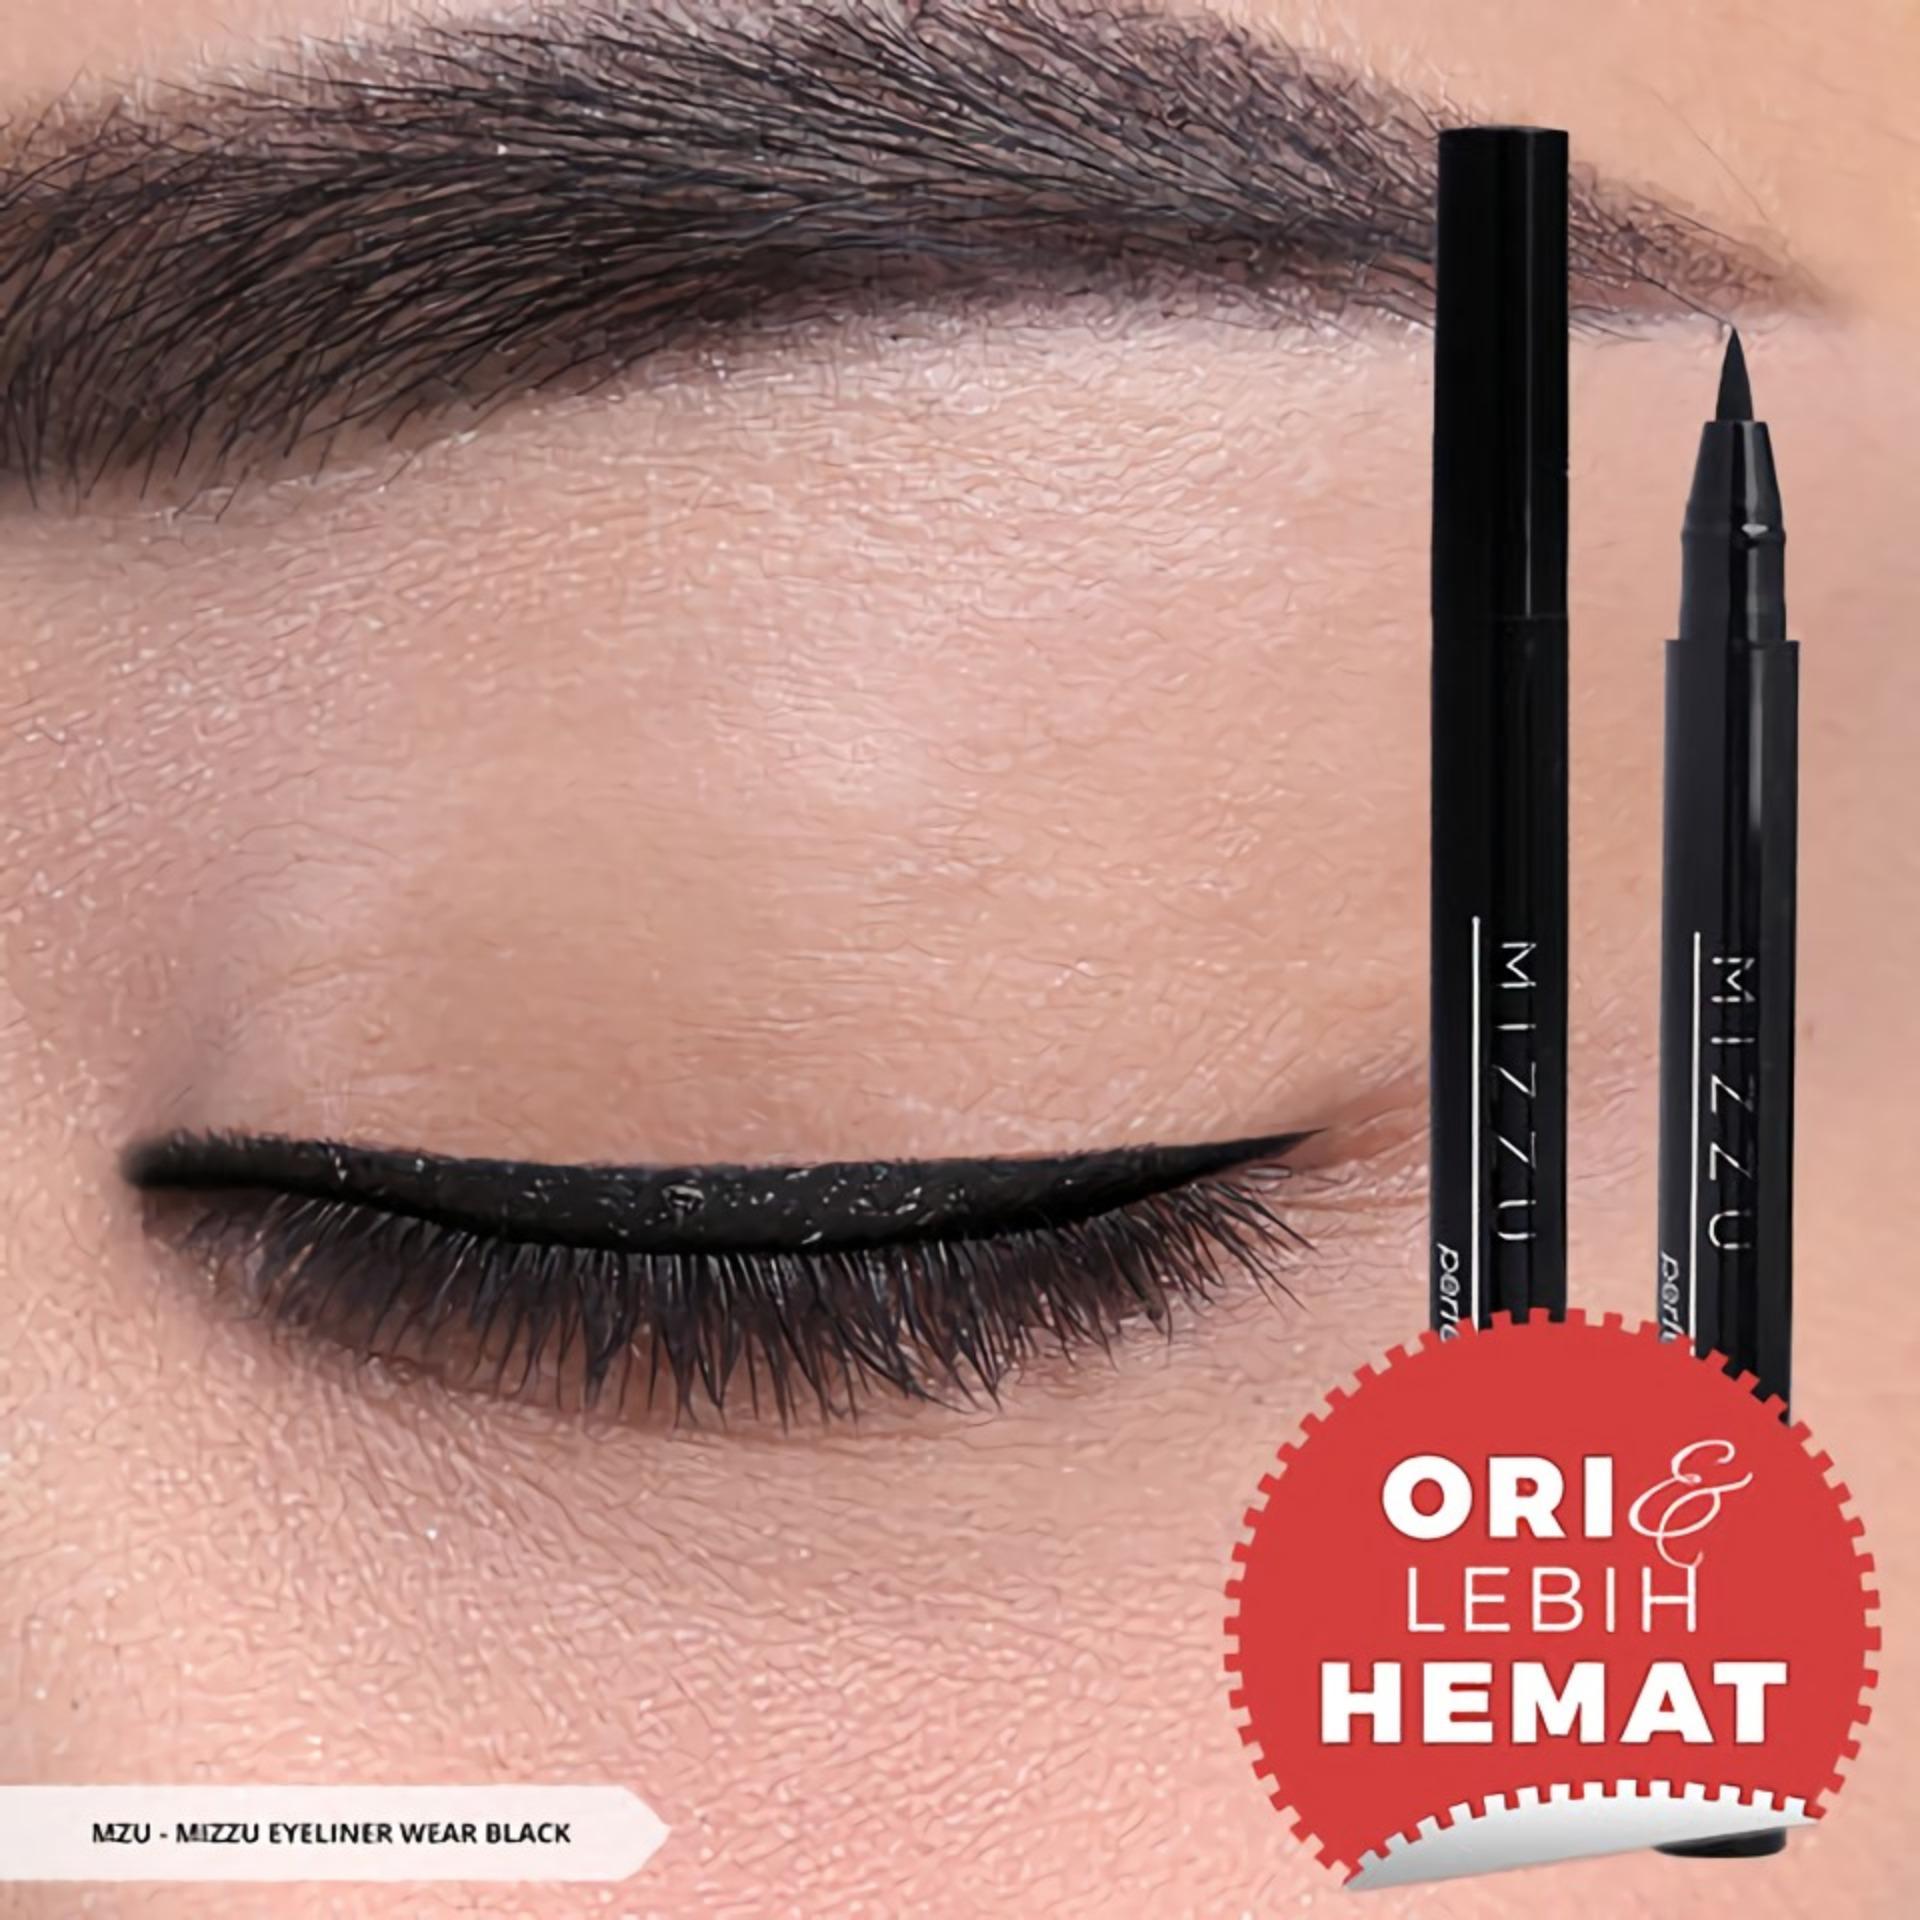 Mizzu Eyeliner Pen Perfect Wear (Black) - Warna Pigmented Eyeliner